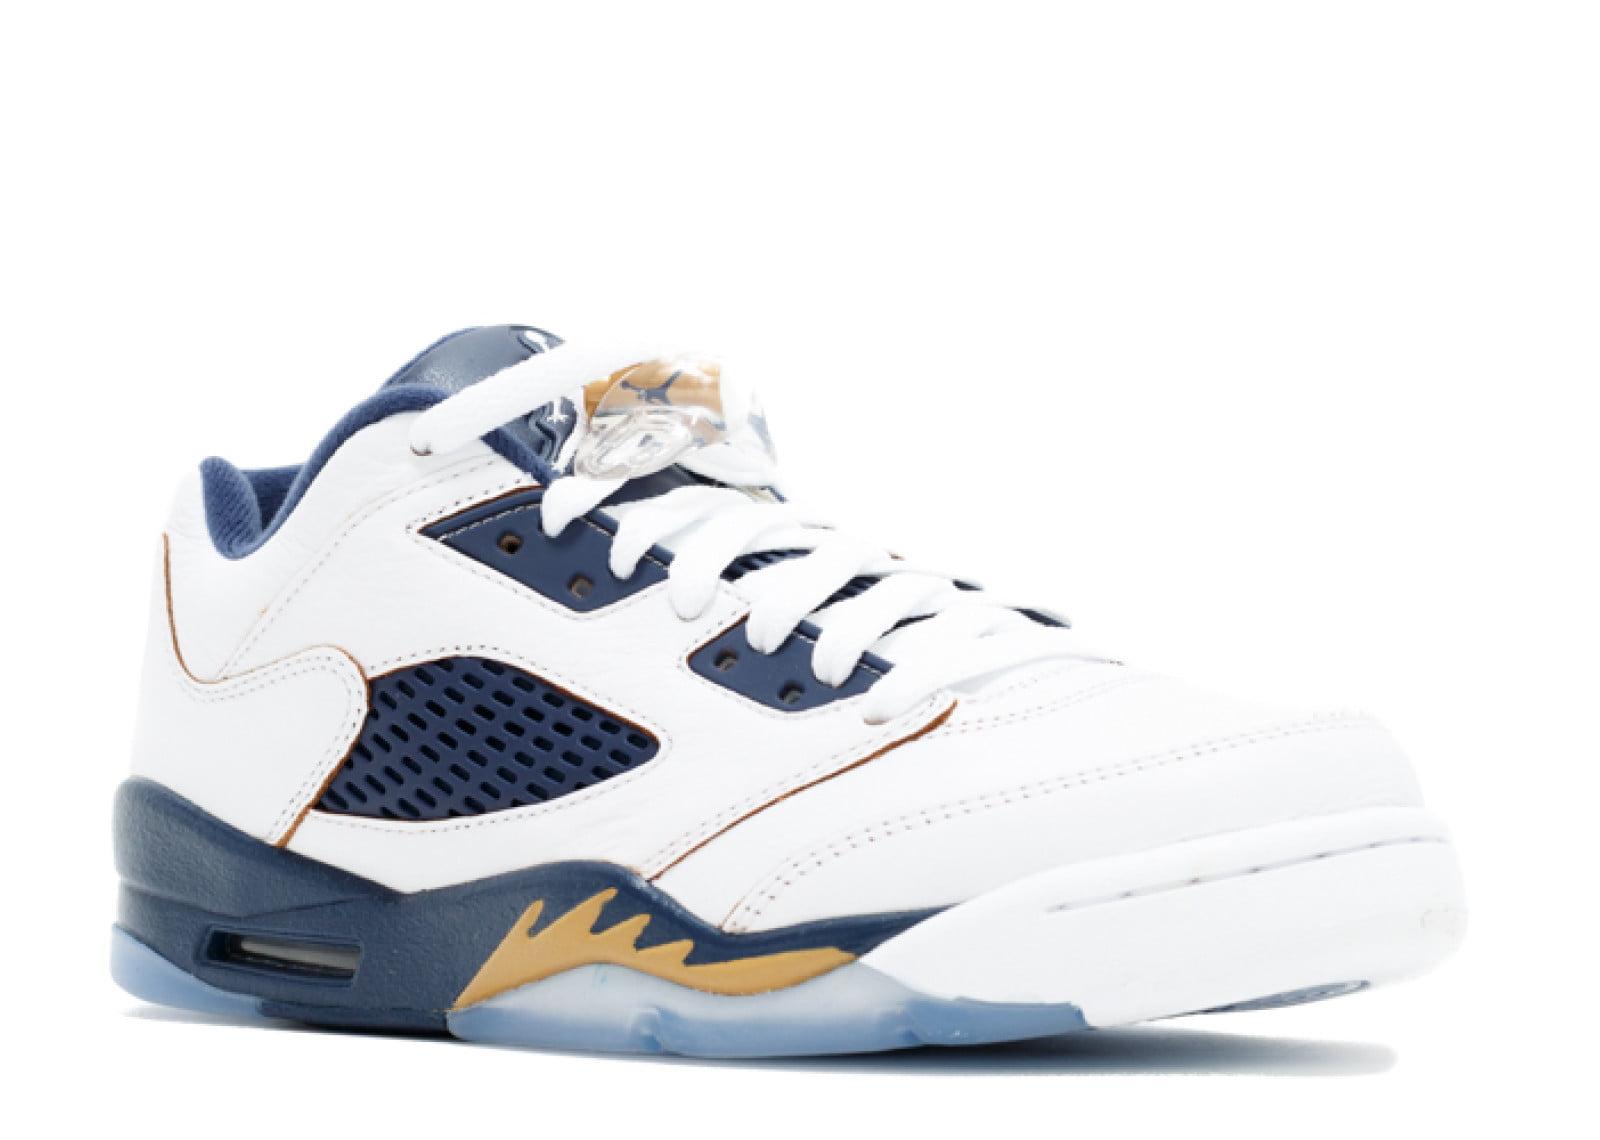 new product 92455 4f147 Nike Jordan Kids Air Jordan 5 Retro Low (GS) Basketball Shoe